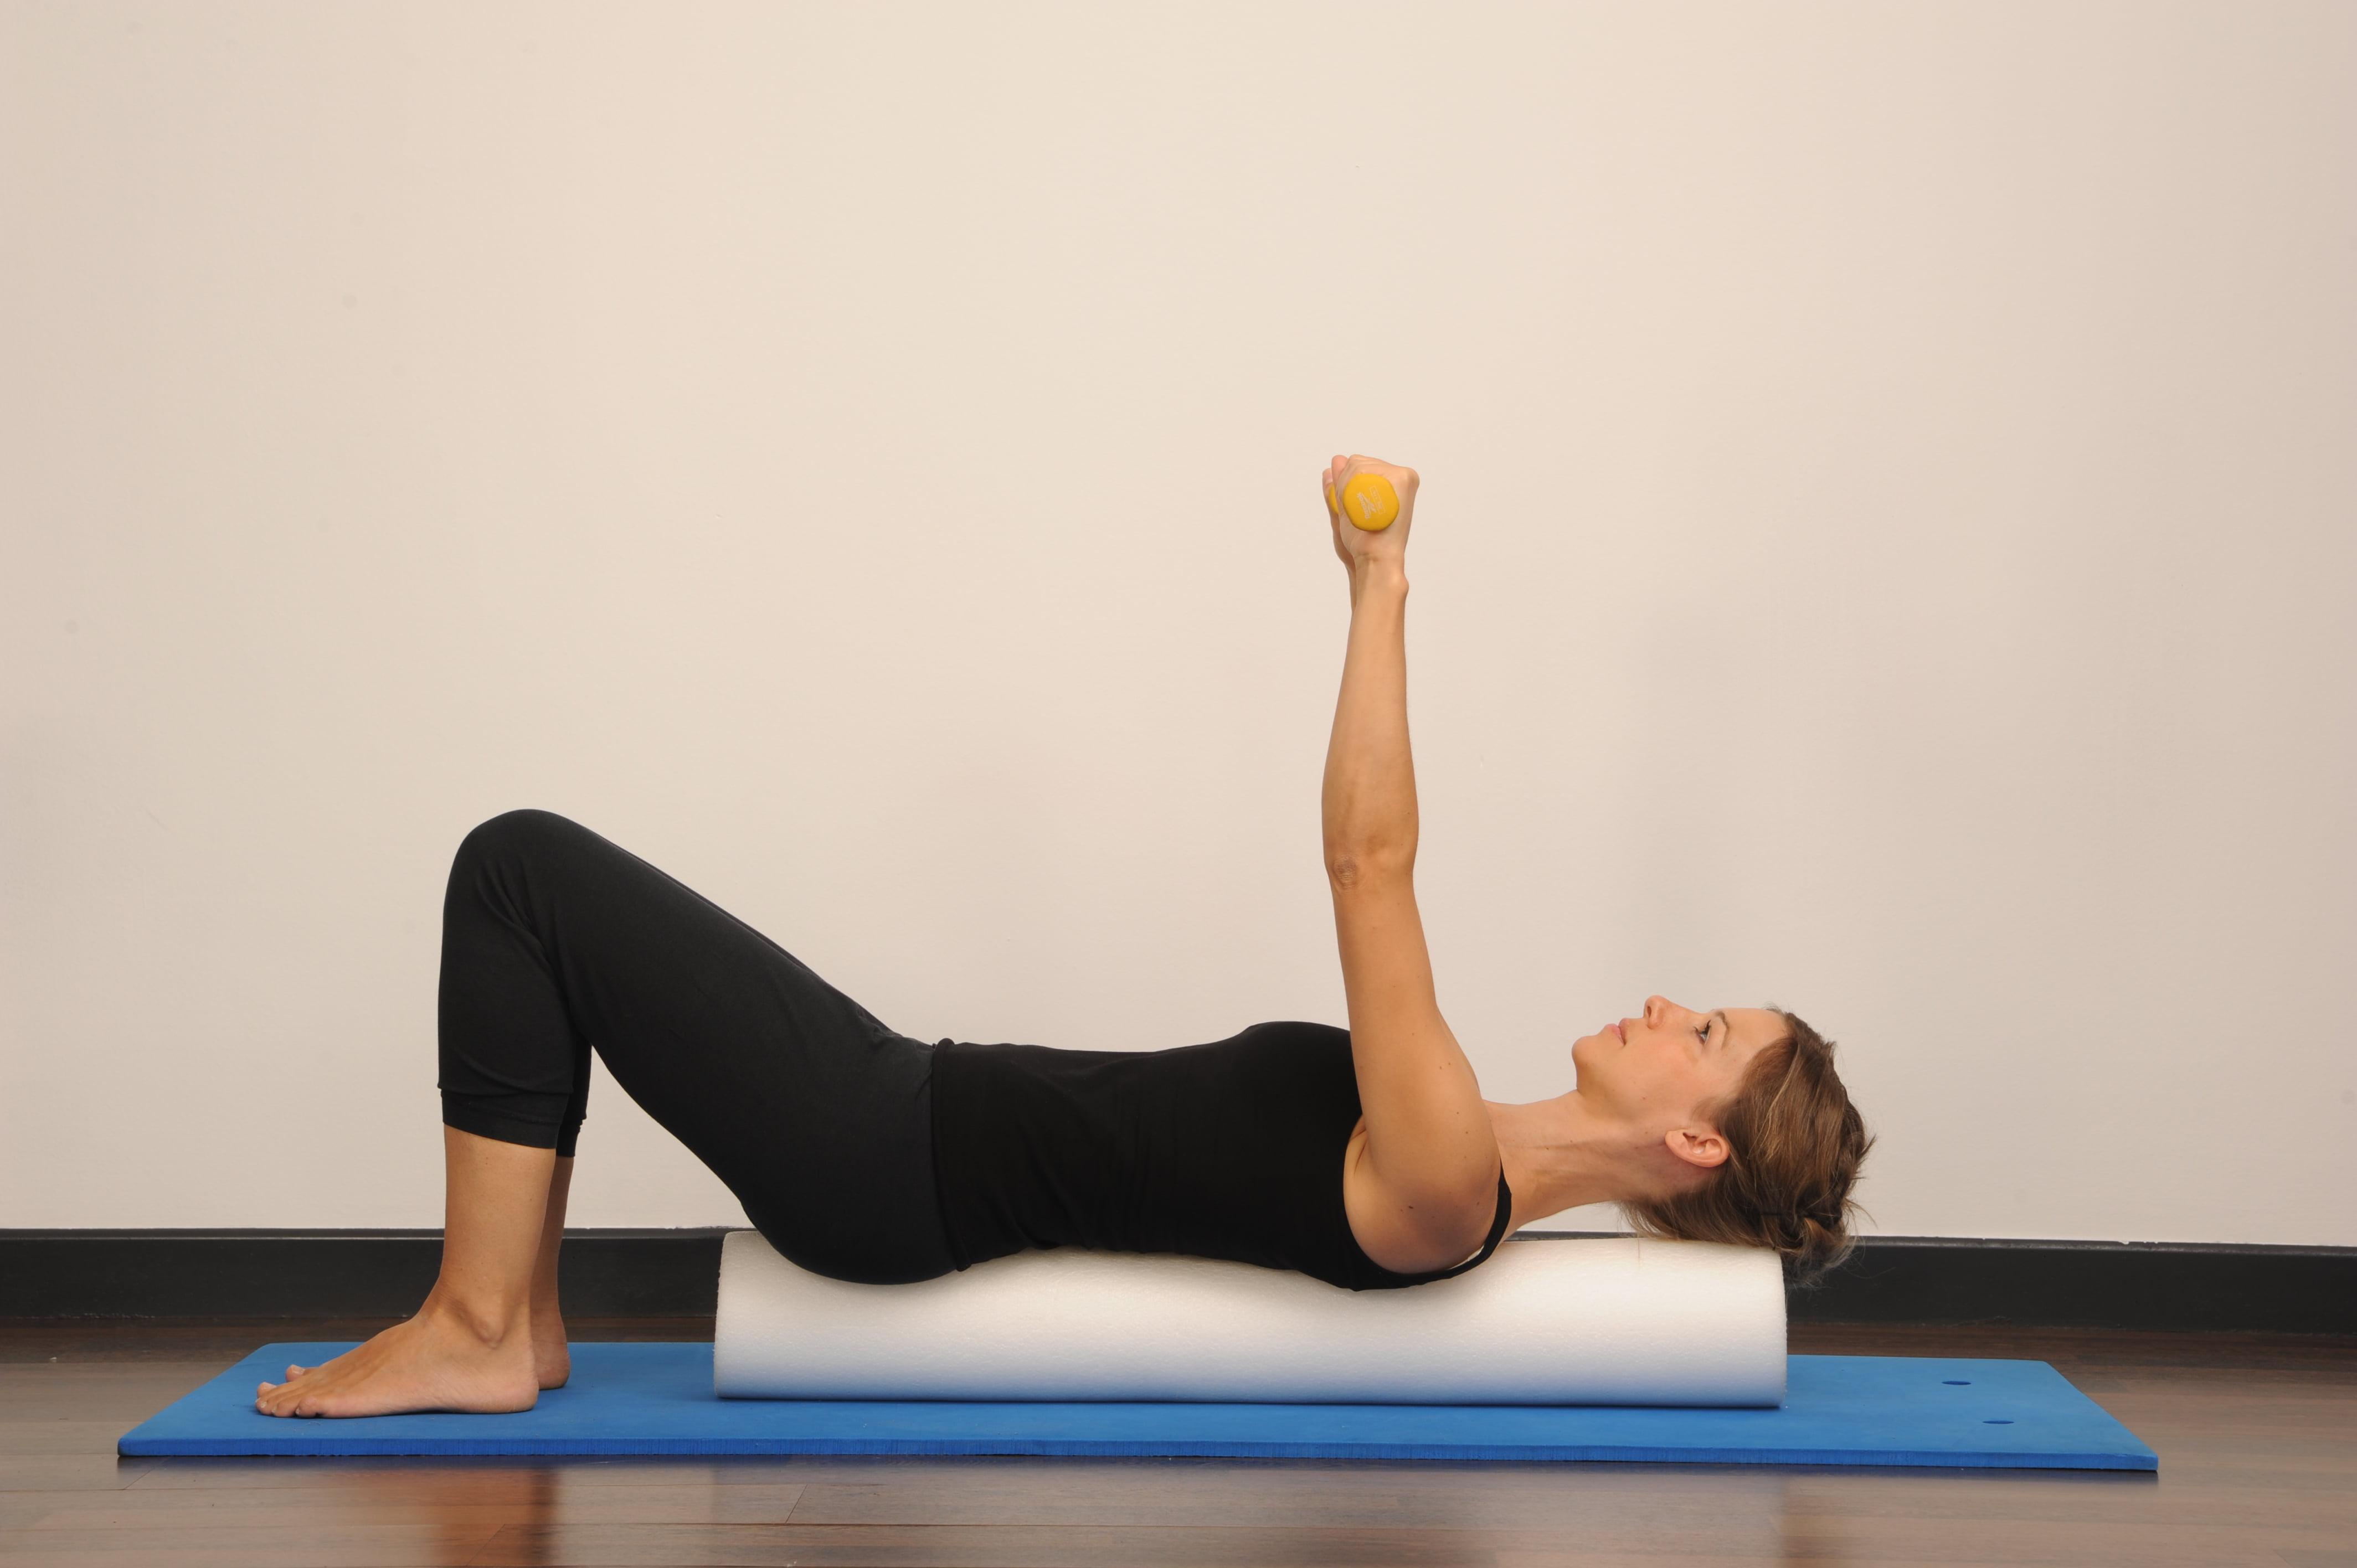 Prächtig Übungen Foam Roller oder Zylinder Pilates Studio & Klasse Dénia &EY_68